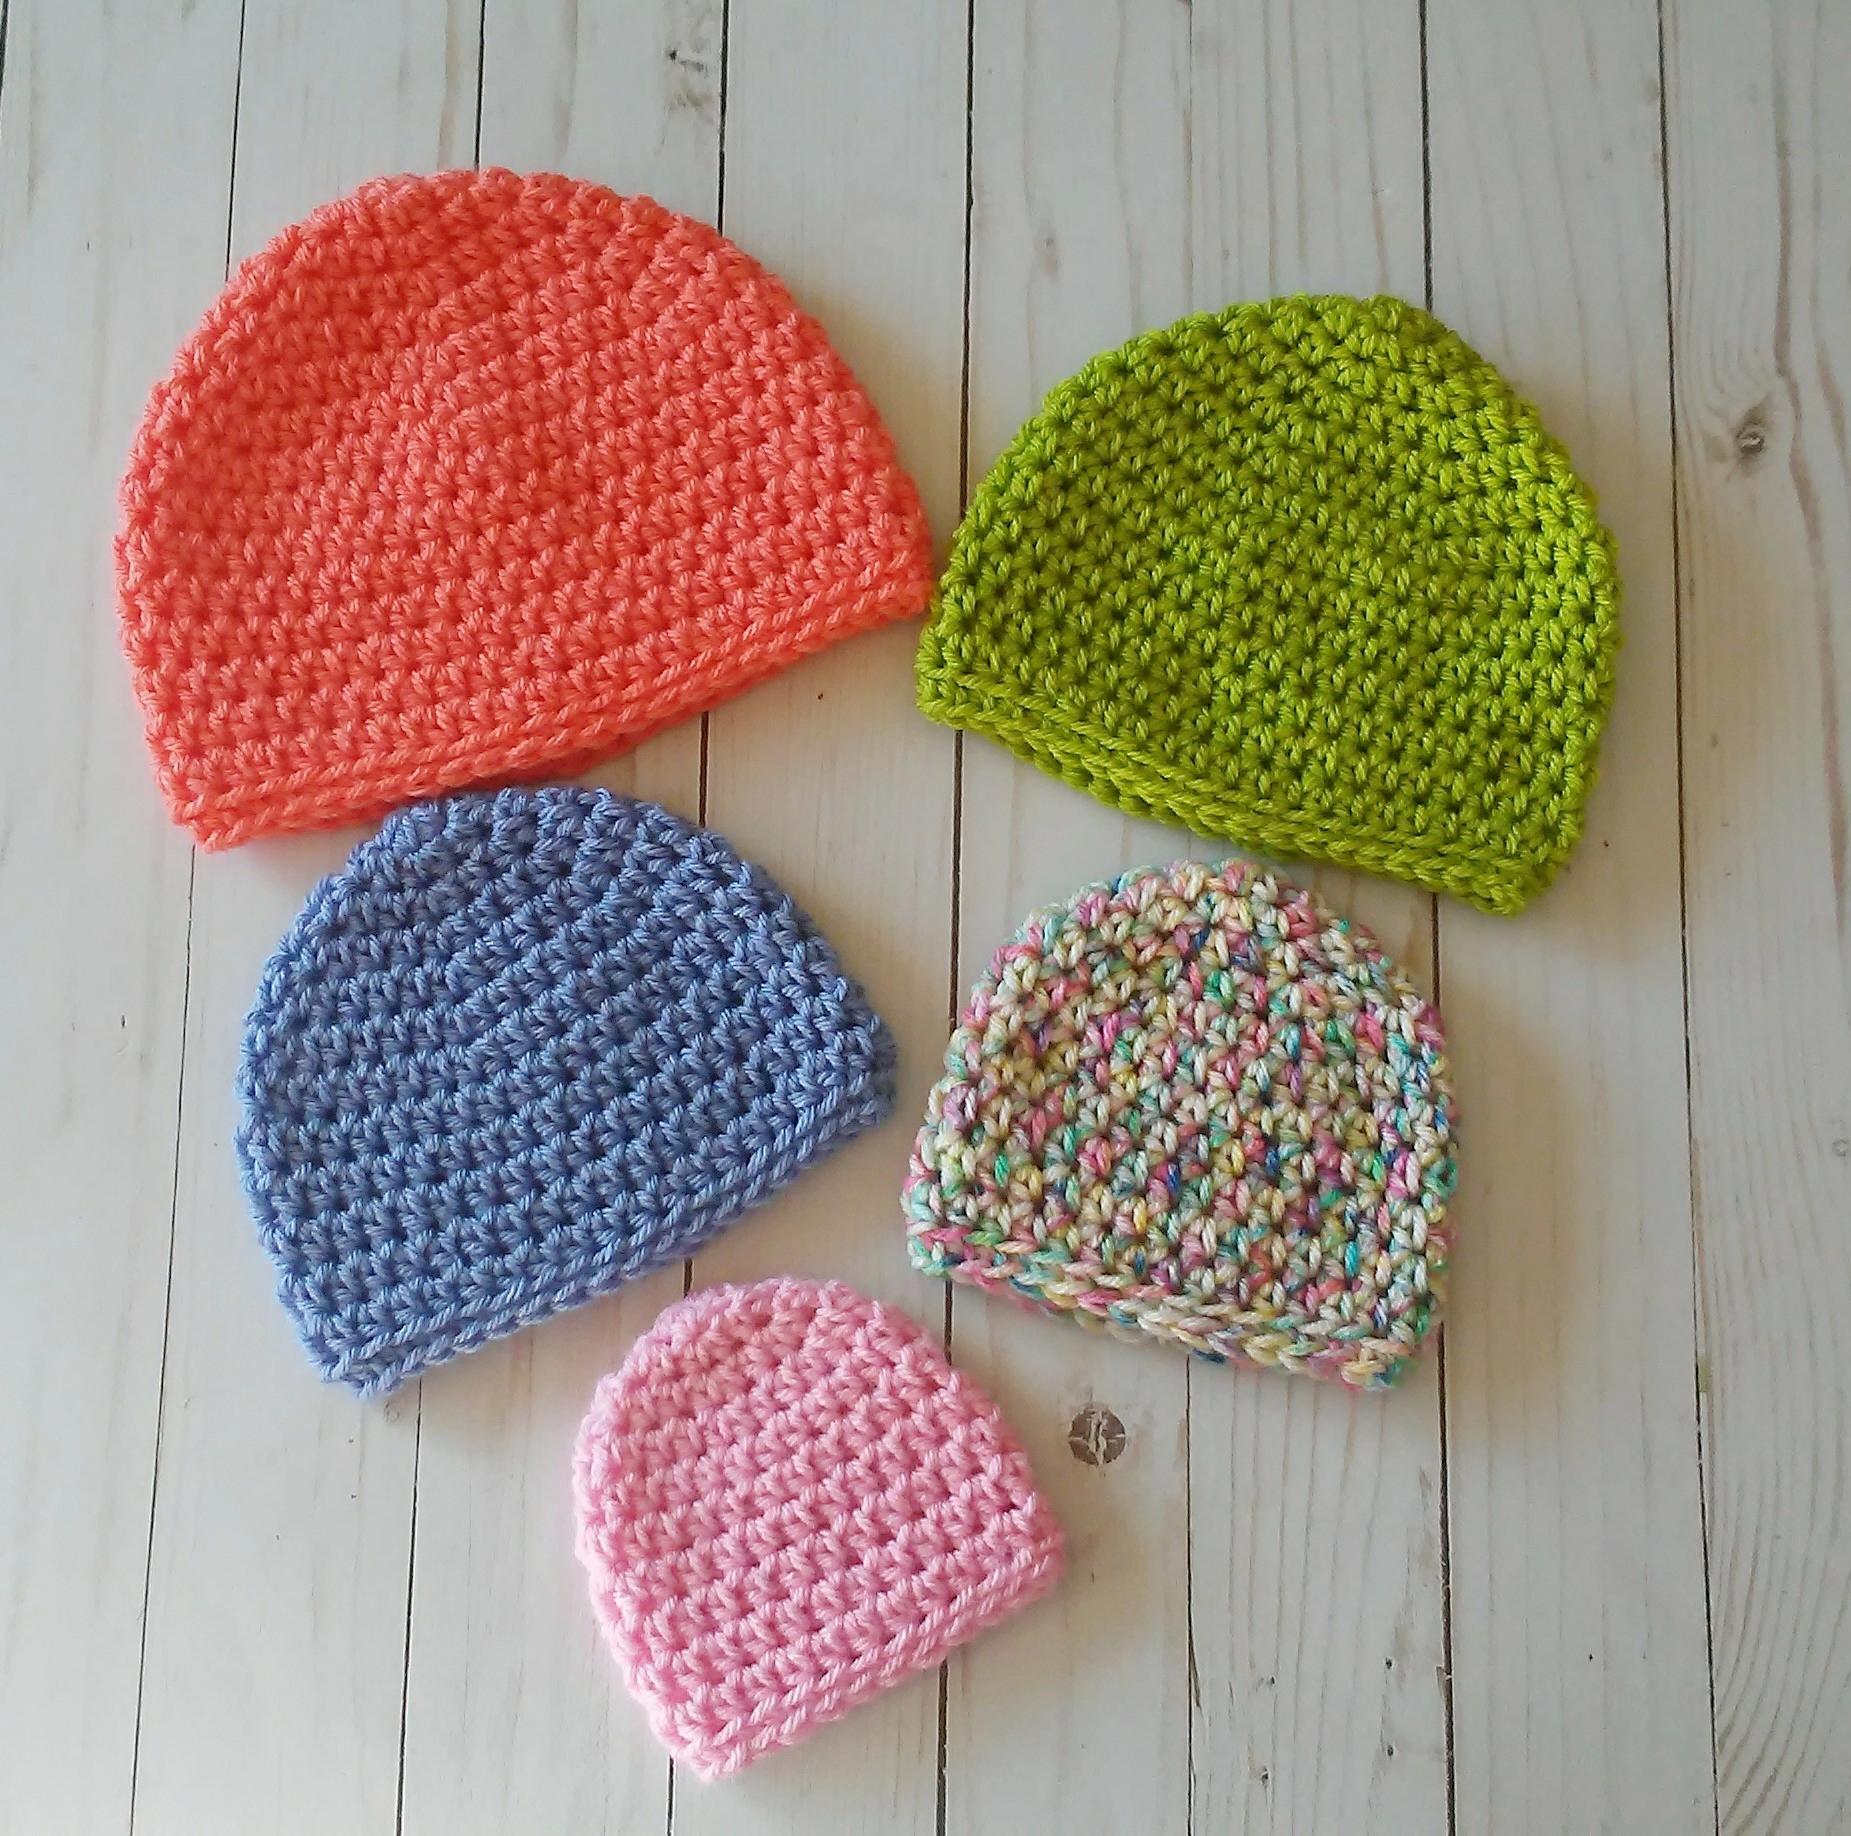 Crochet Baby Beanie 0-3month